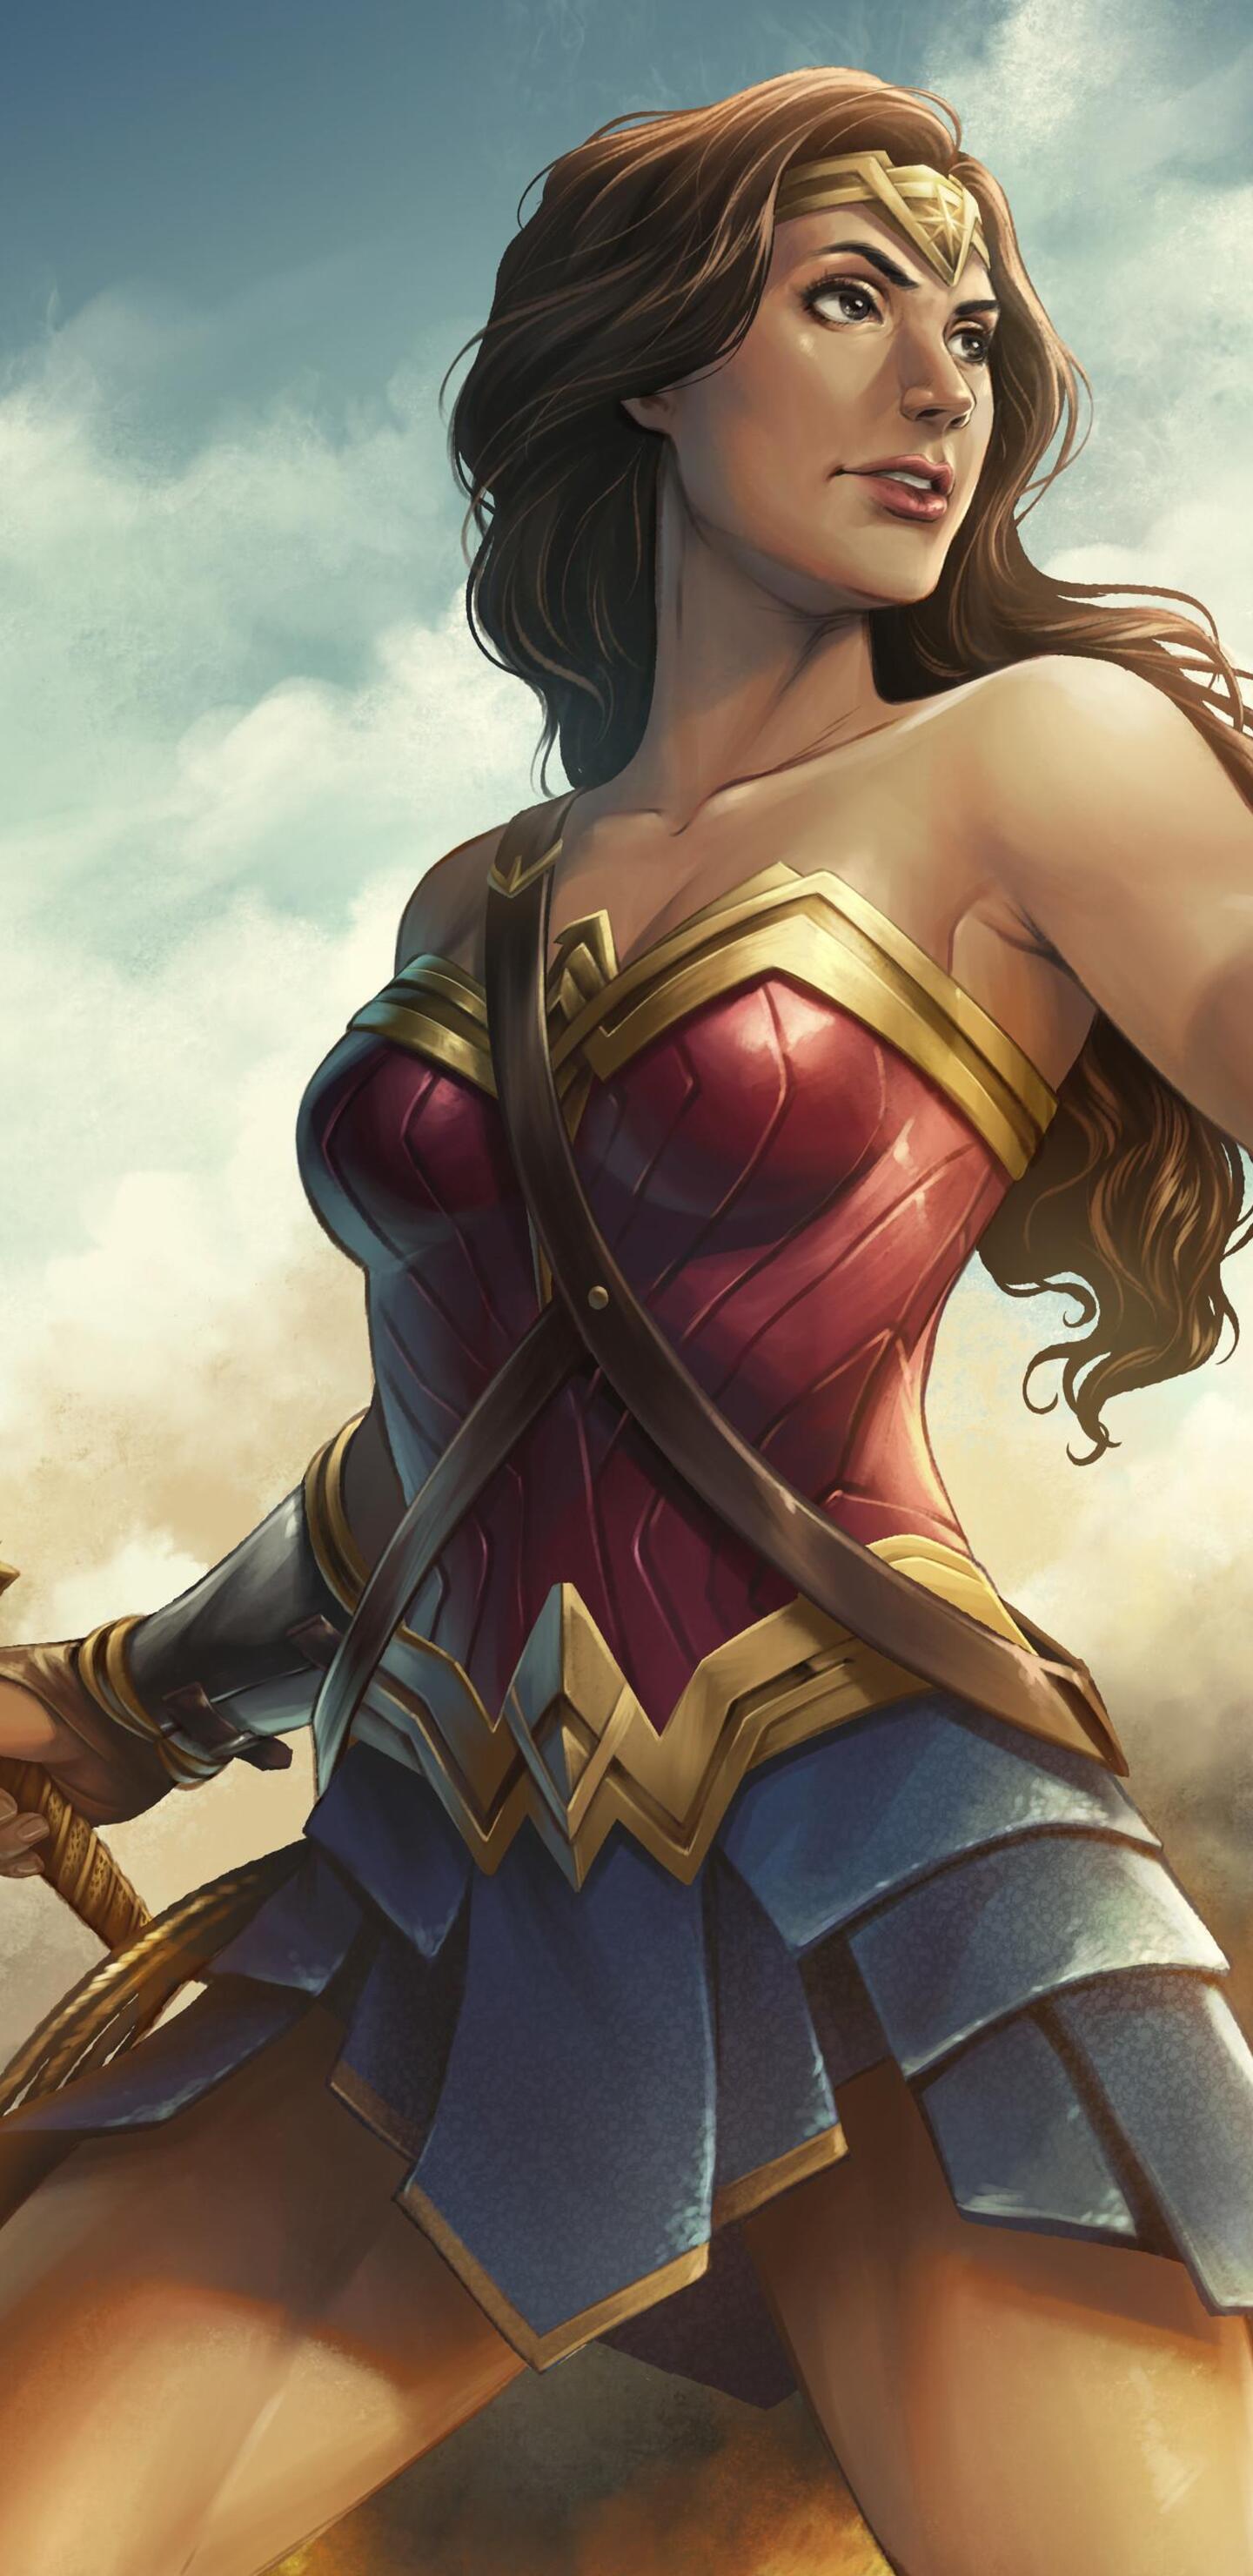 1440x2960 Wonder Woman Artwork Hd Samsung Galaxy Note 9 8 S9 S8 S8